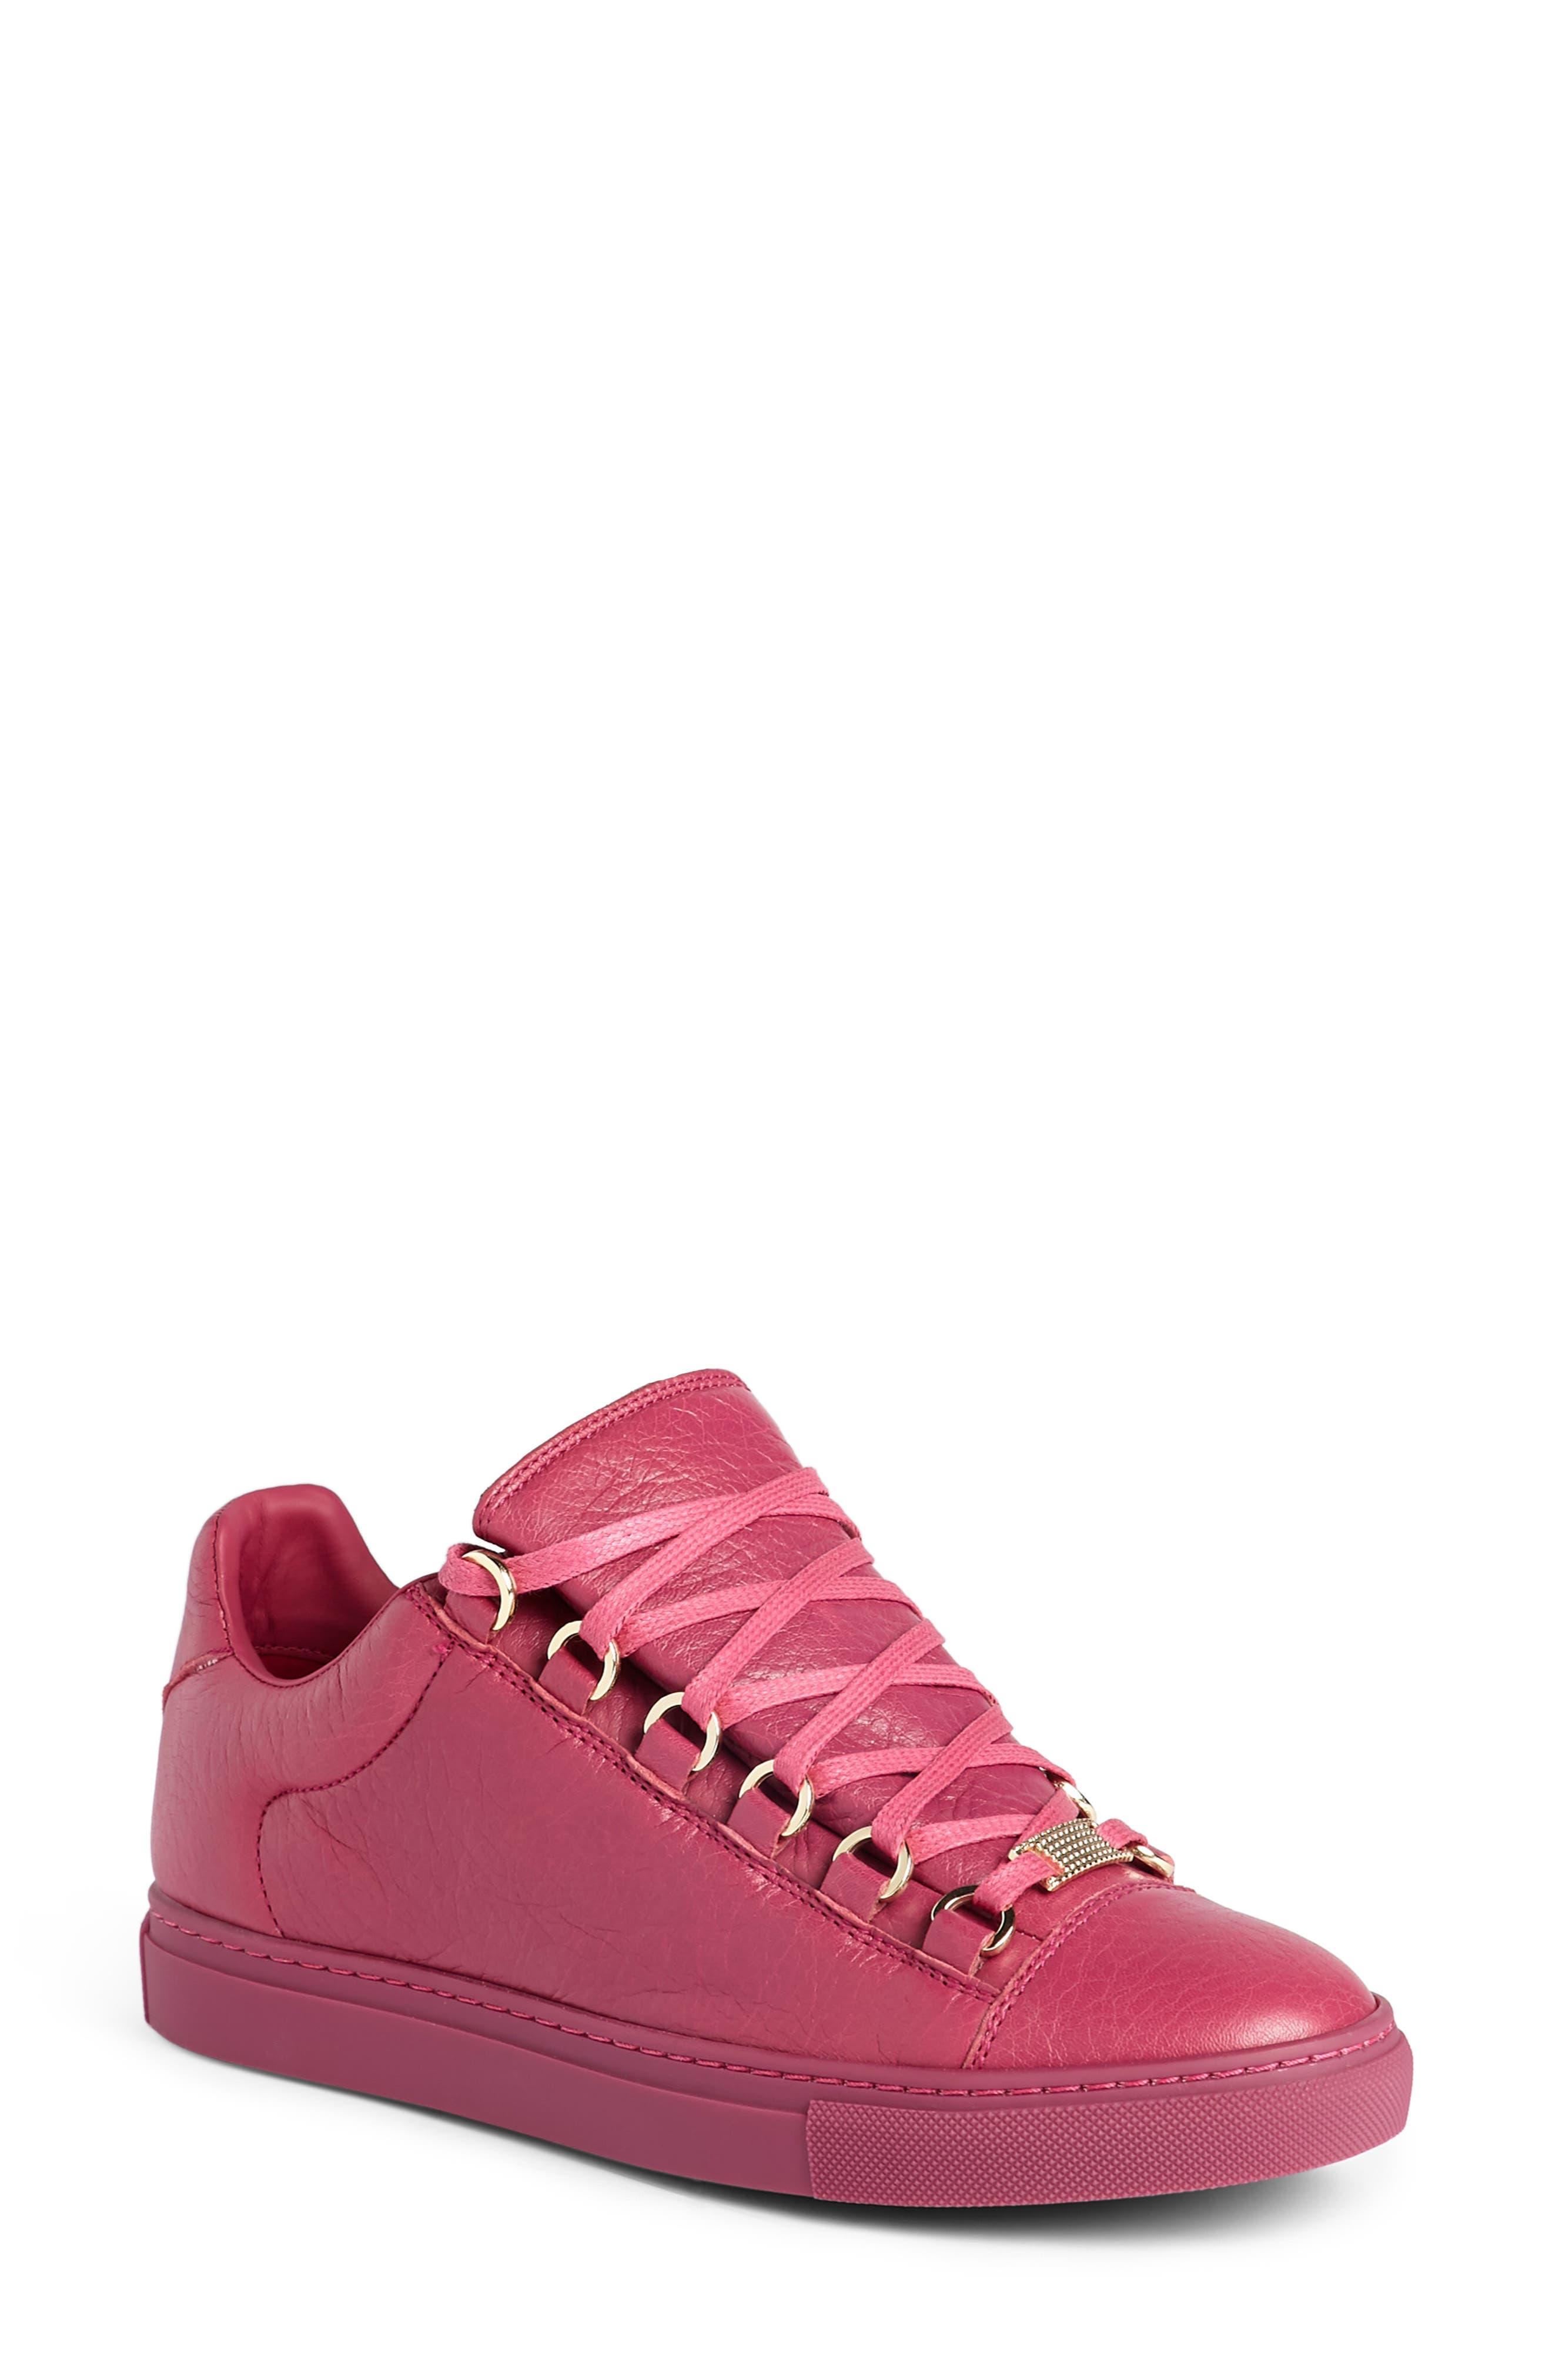 Balenciaga Low Top Sneaker (Women)